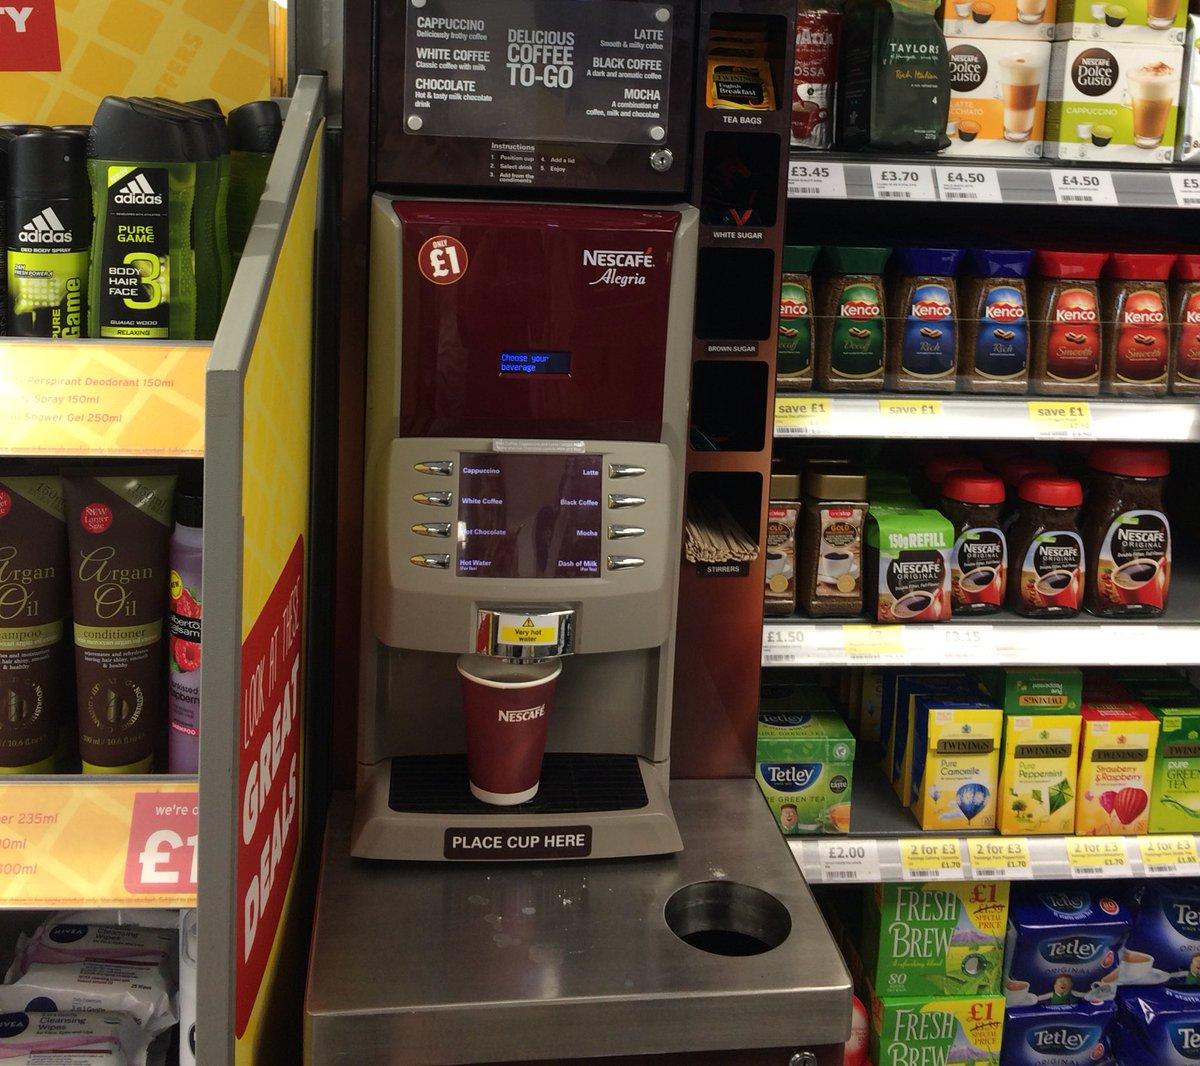 I was in need of a #caffeine kick! @onestopstores #Alegria #coffee @NestleProDerick<br>http://pic.twitter.com/CUJMFvYh5g